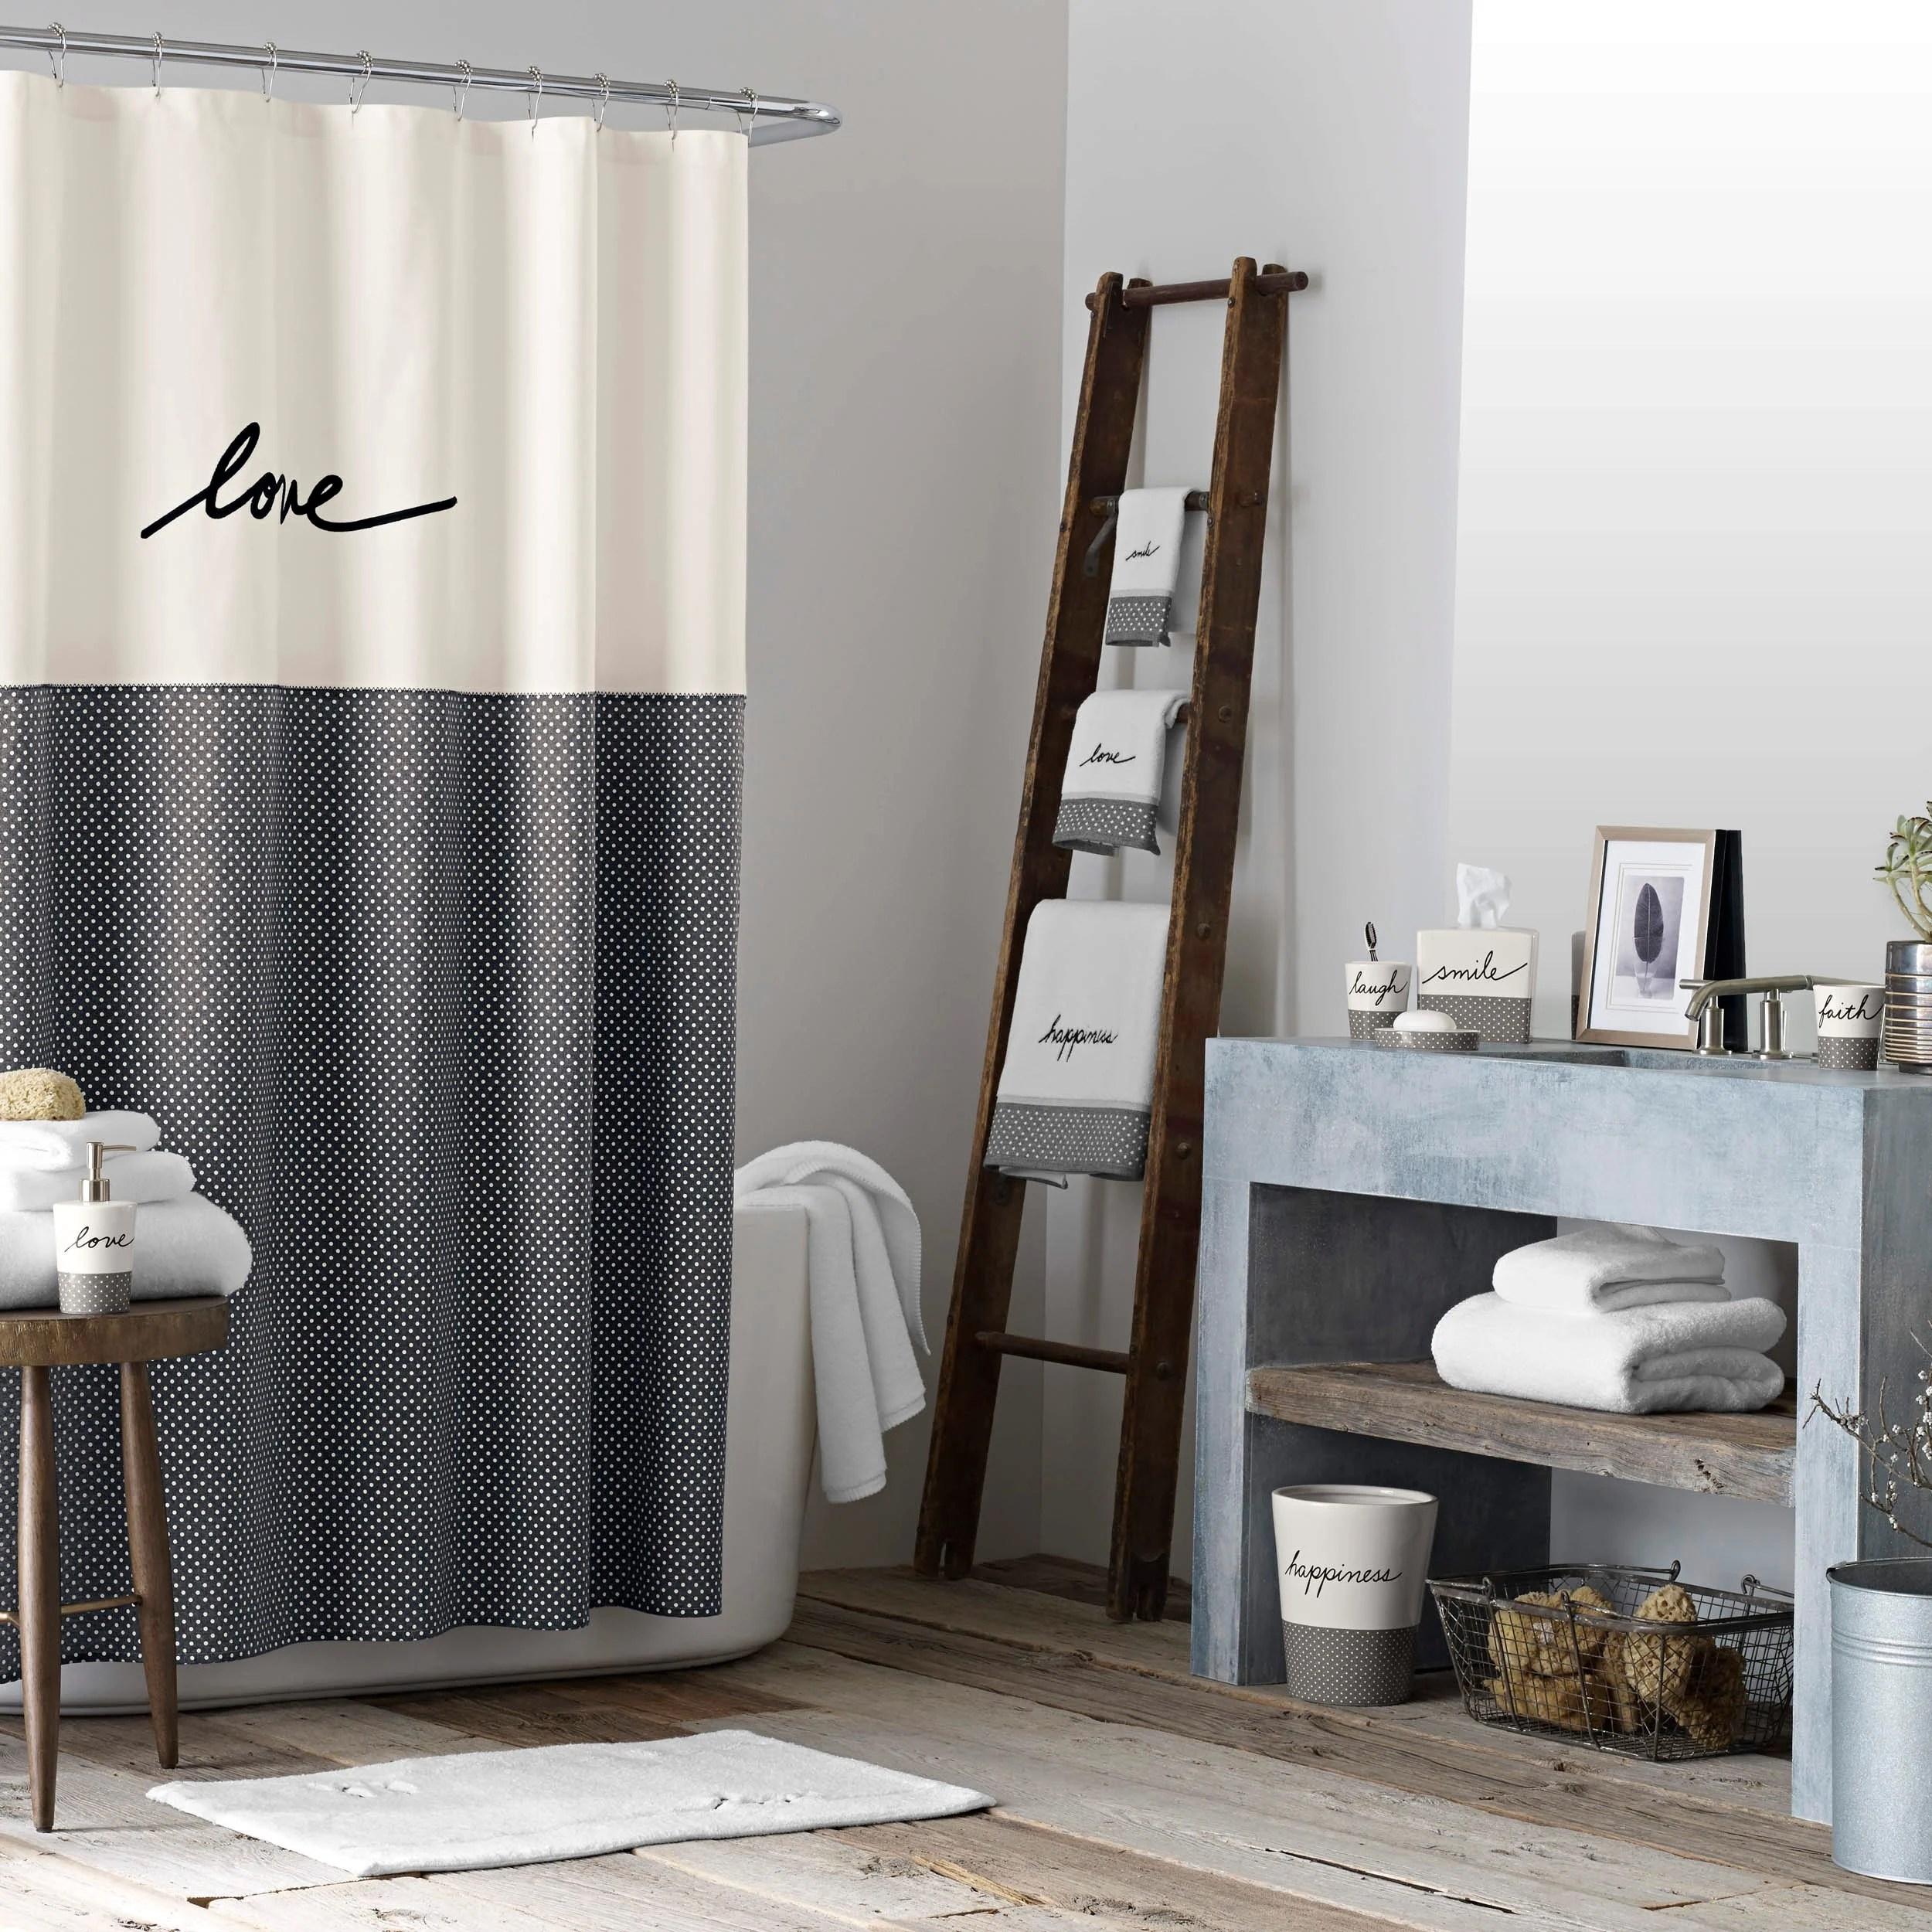 فكرة غادر يتملص love shower curtain